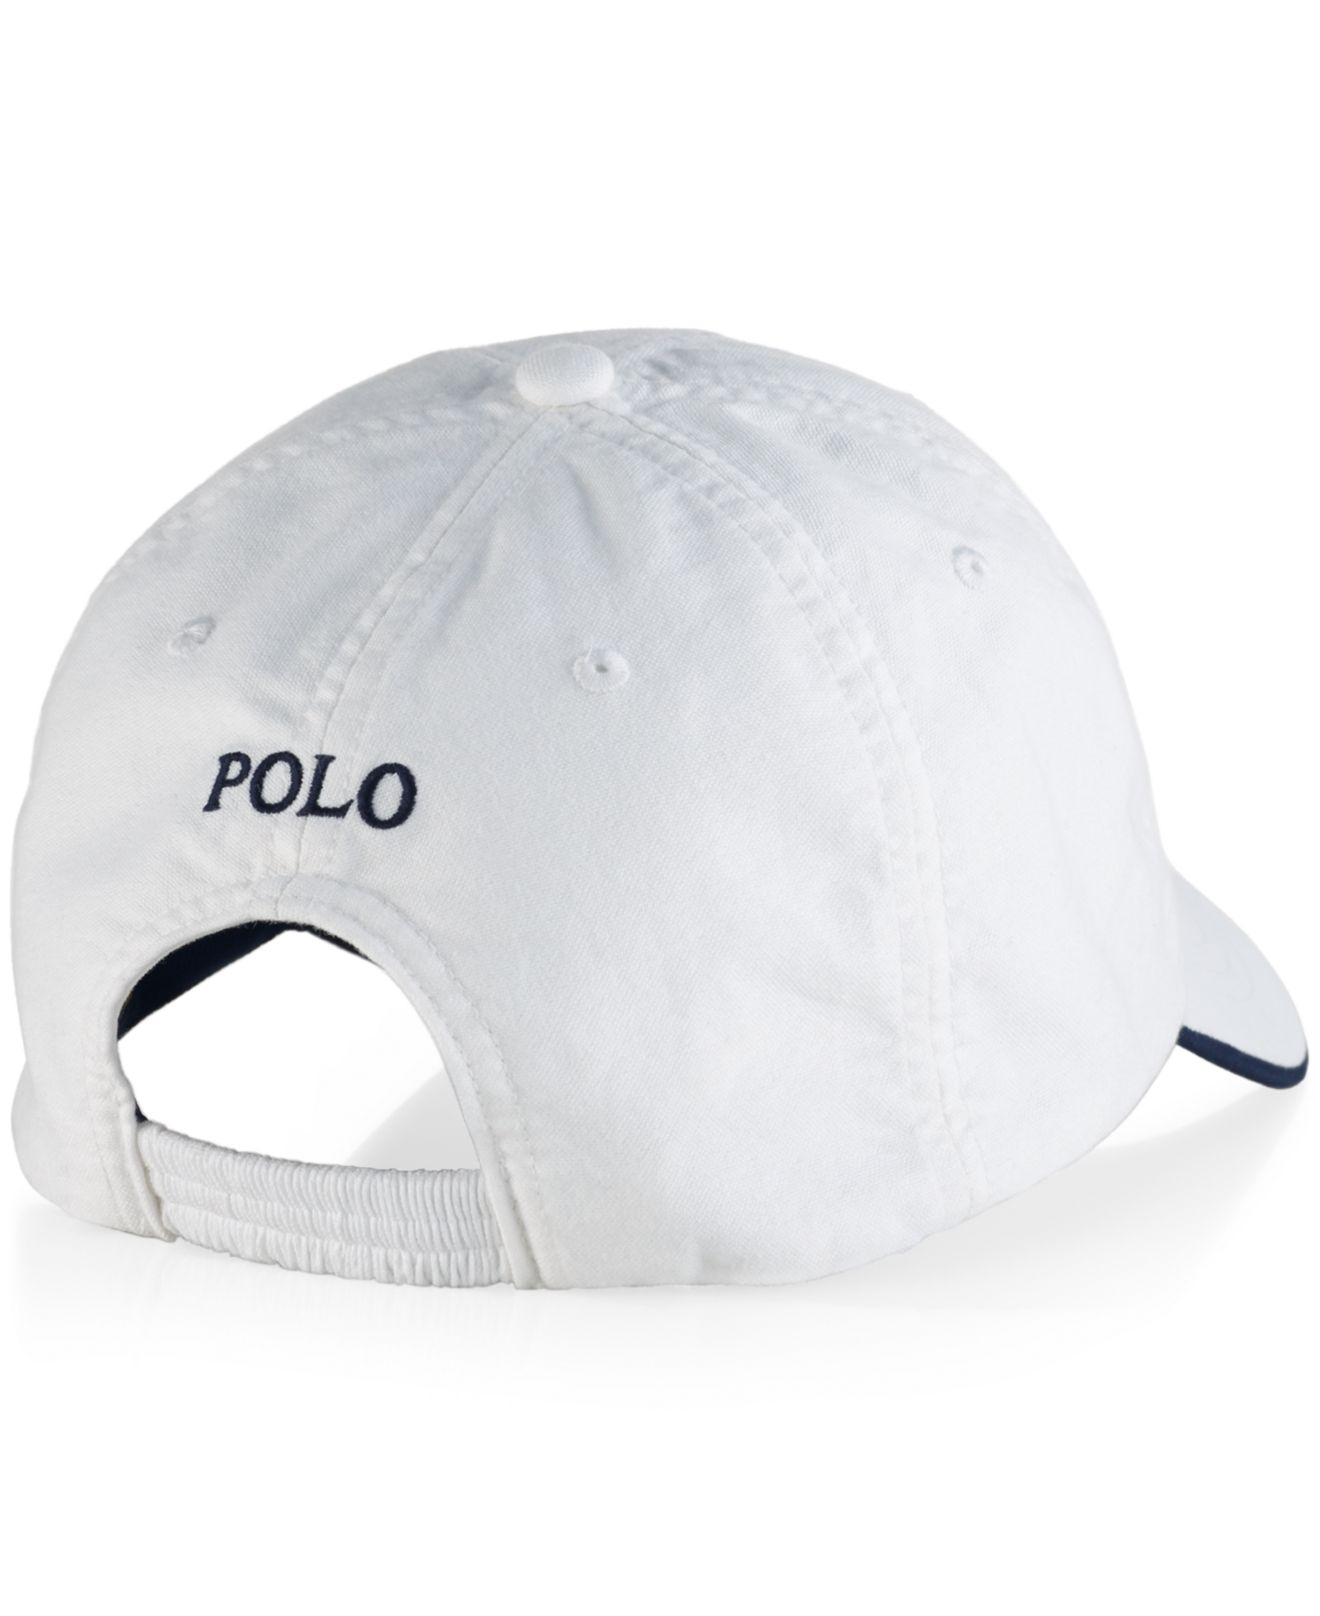 polo ralph lauren oxford heritage cap in white for men lyst. Black Bedroom Furniture Sets. Home Design Ideas